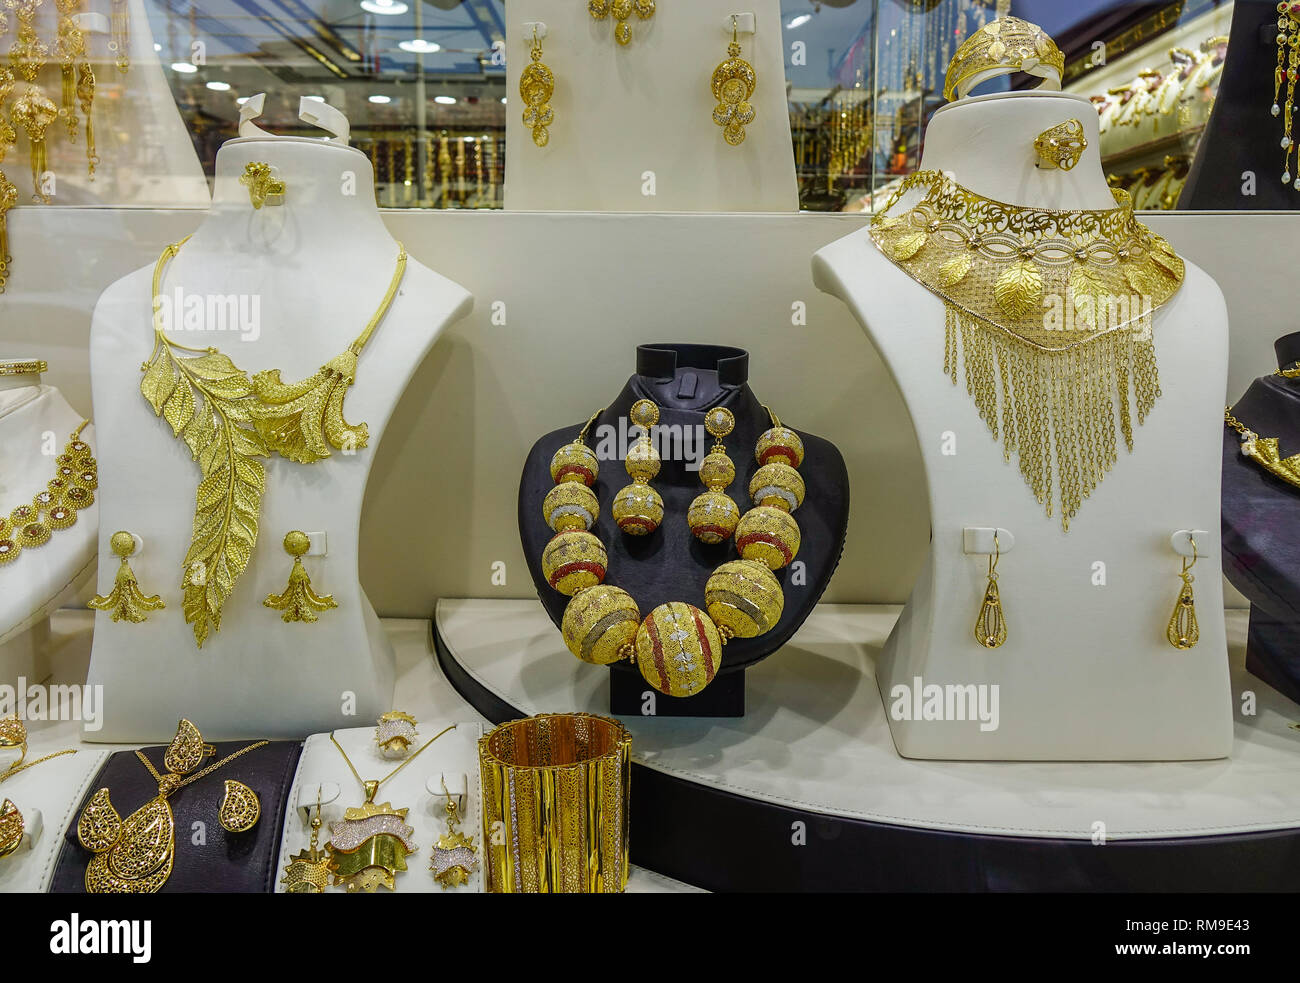 Dubai, UAE - Dec 6, 2018. Gold jewelry in the display window of a jewelleries shop in Dubai Gold Bazaar (Souk). - Stock Image